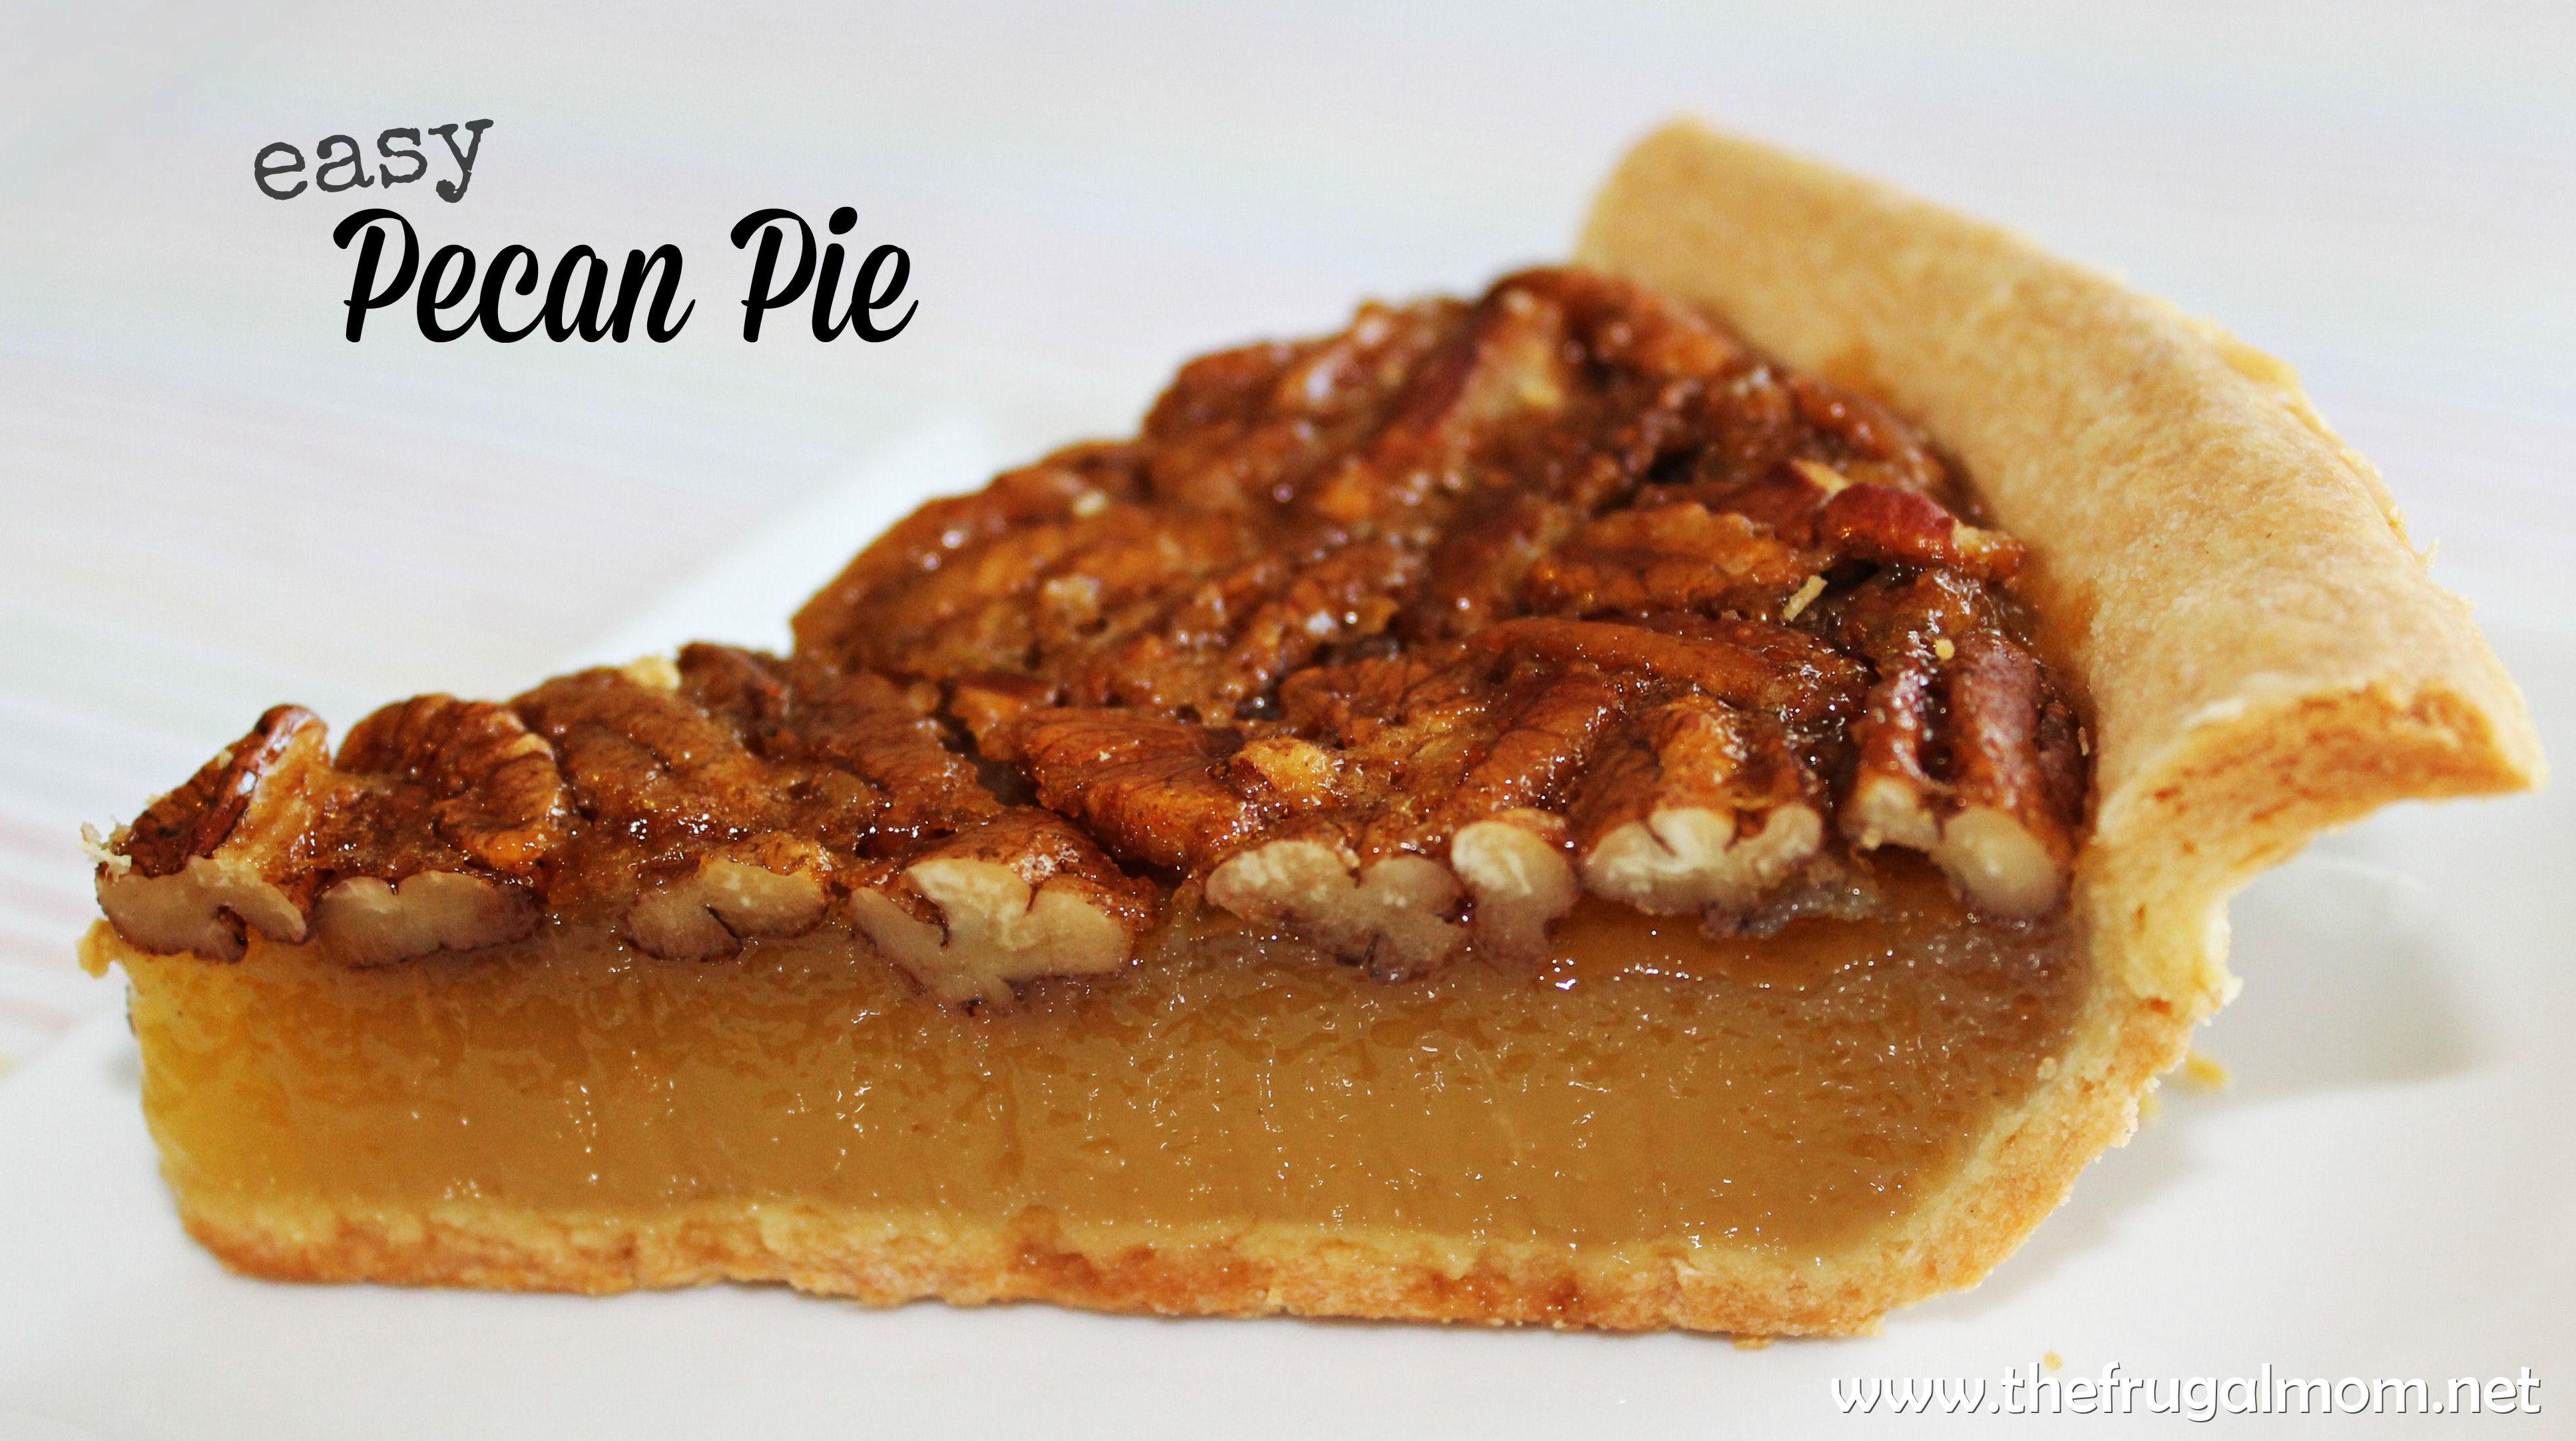 Pecan Pie Recipe  An Easy Pecan Pie Recipe The Entire Family Will Enjoy